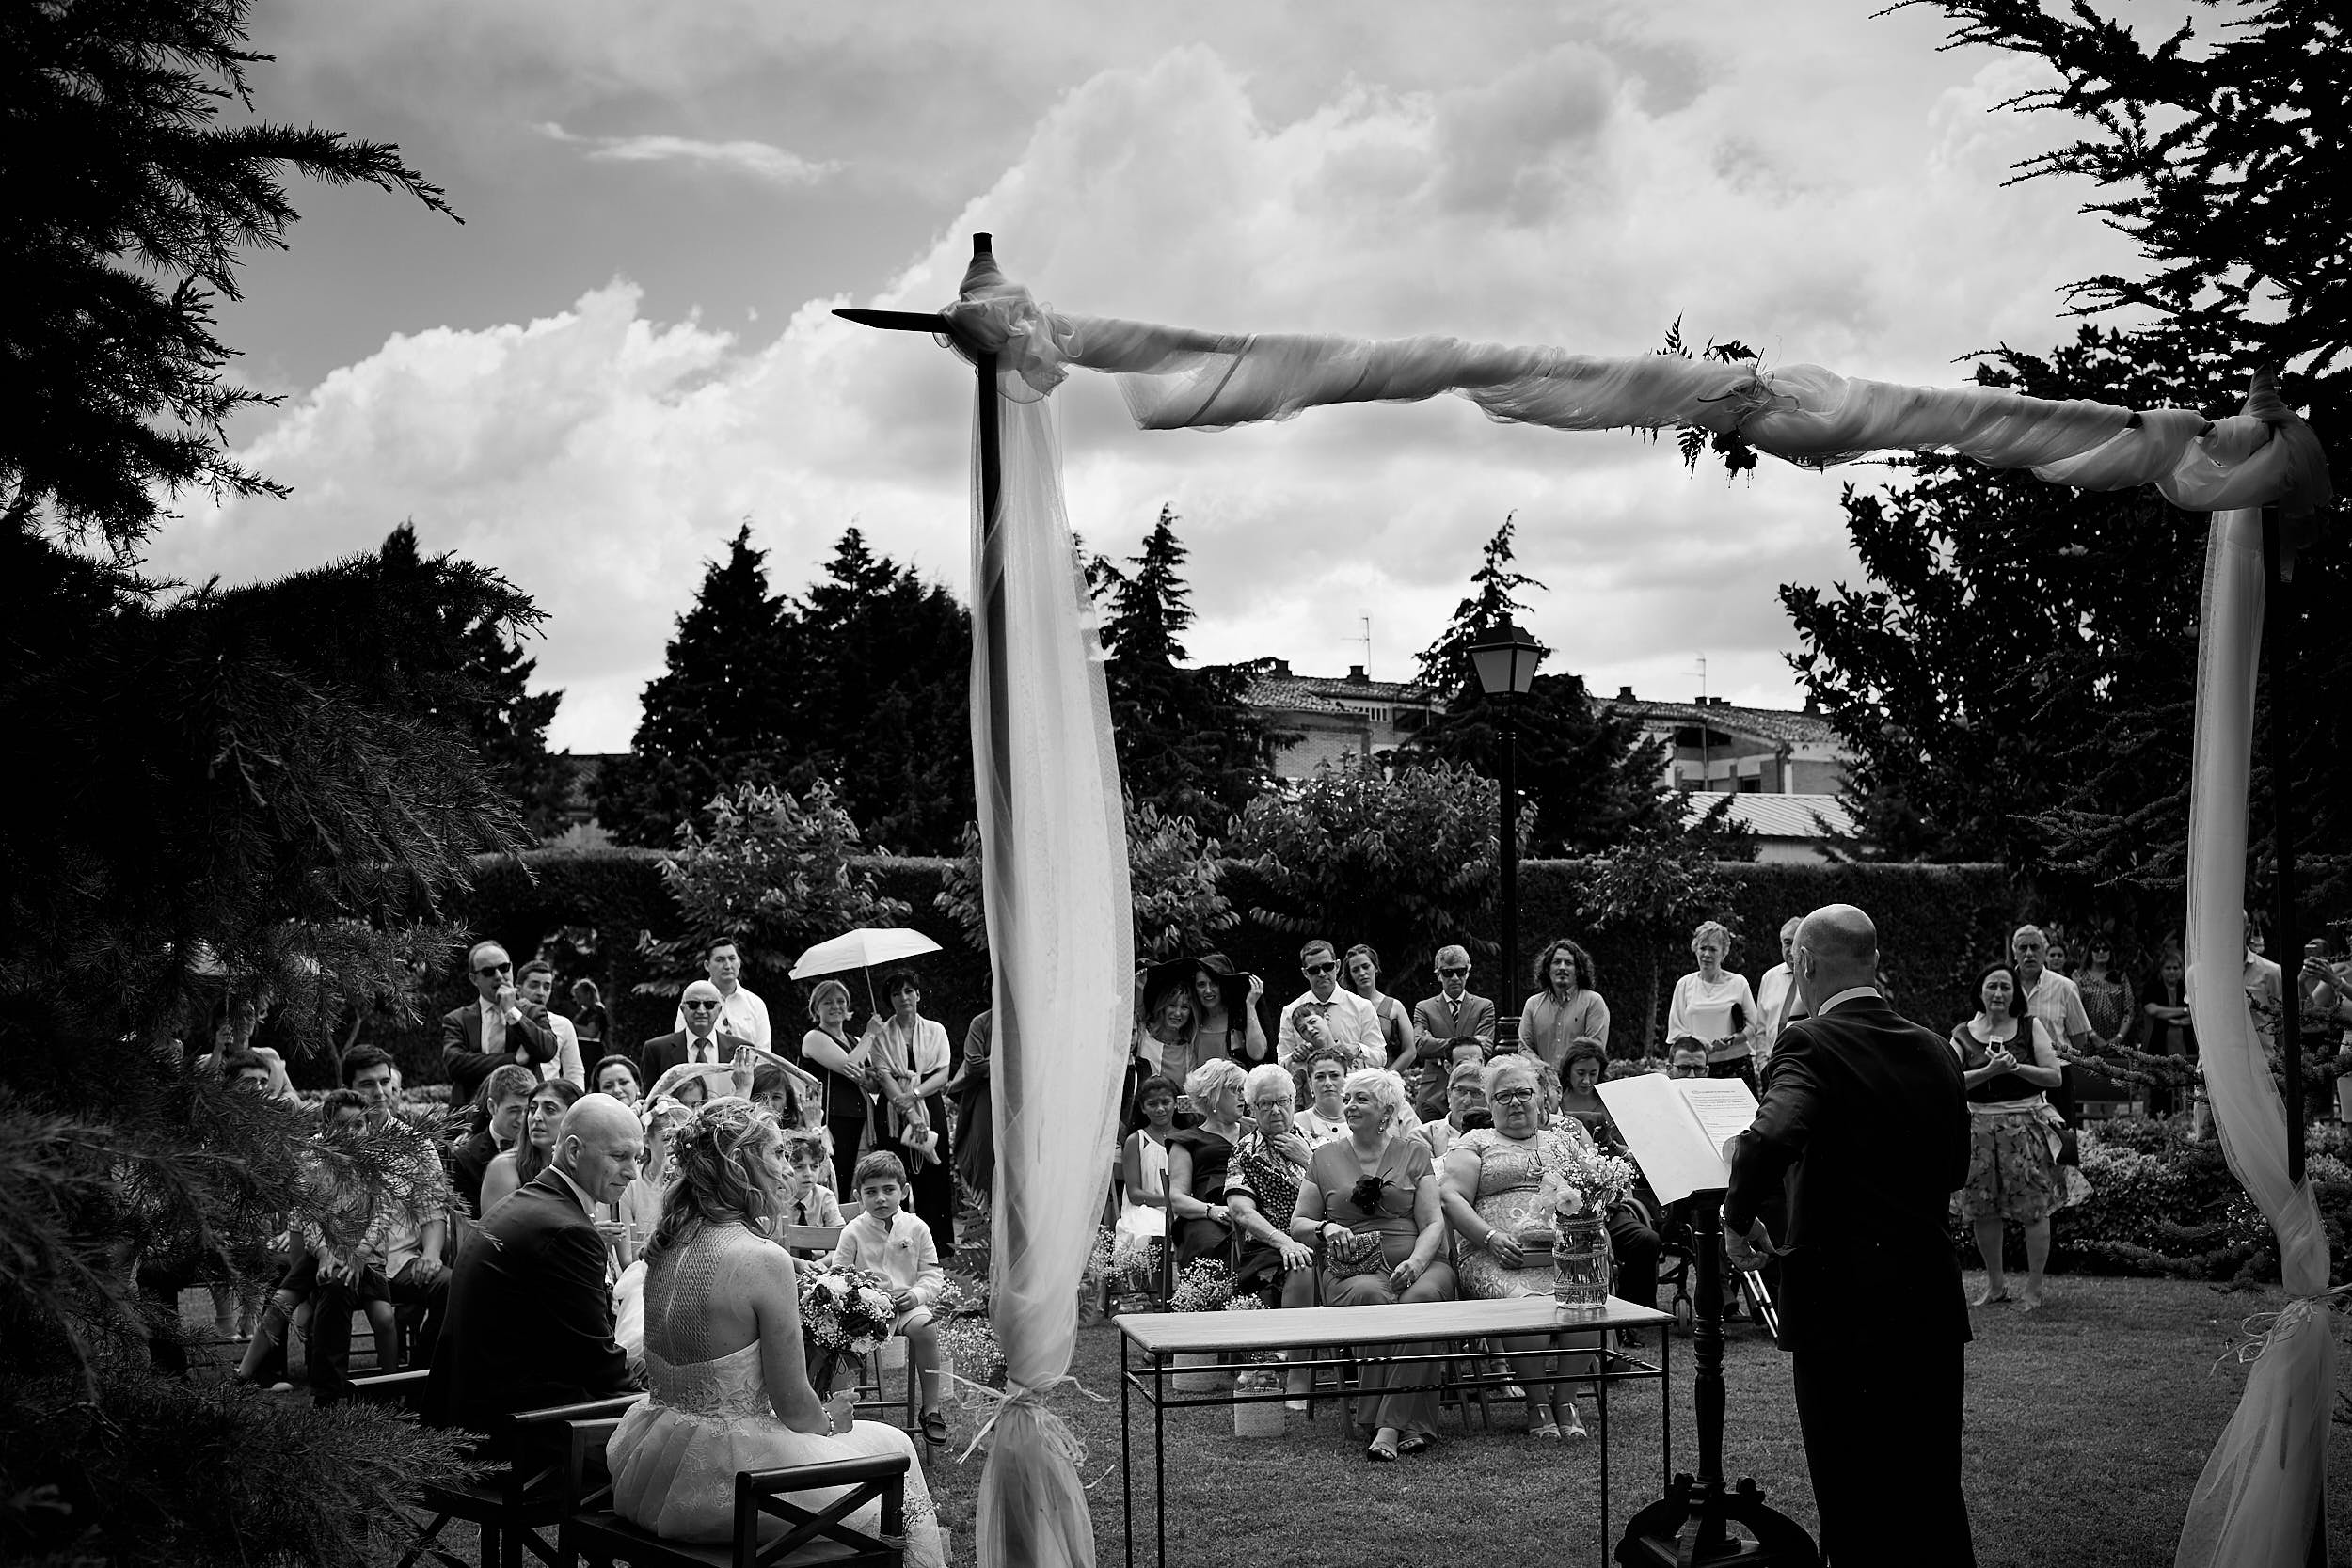 8/7/17 Evange & Juanma. Rioja wedding photographer. Restaurante La Vieja Bodega, Casalarreina, La Rioja, España. Photo by James Sturcke   sturcke.org